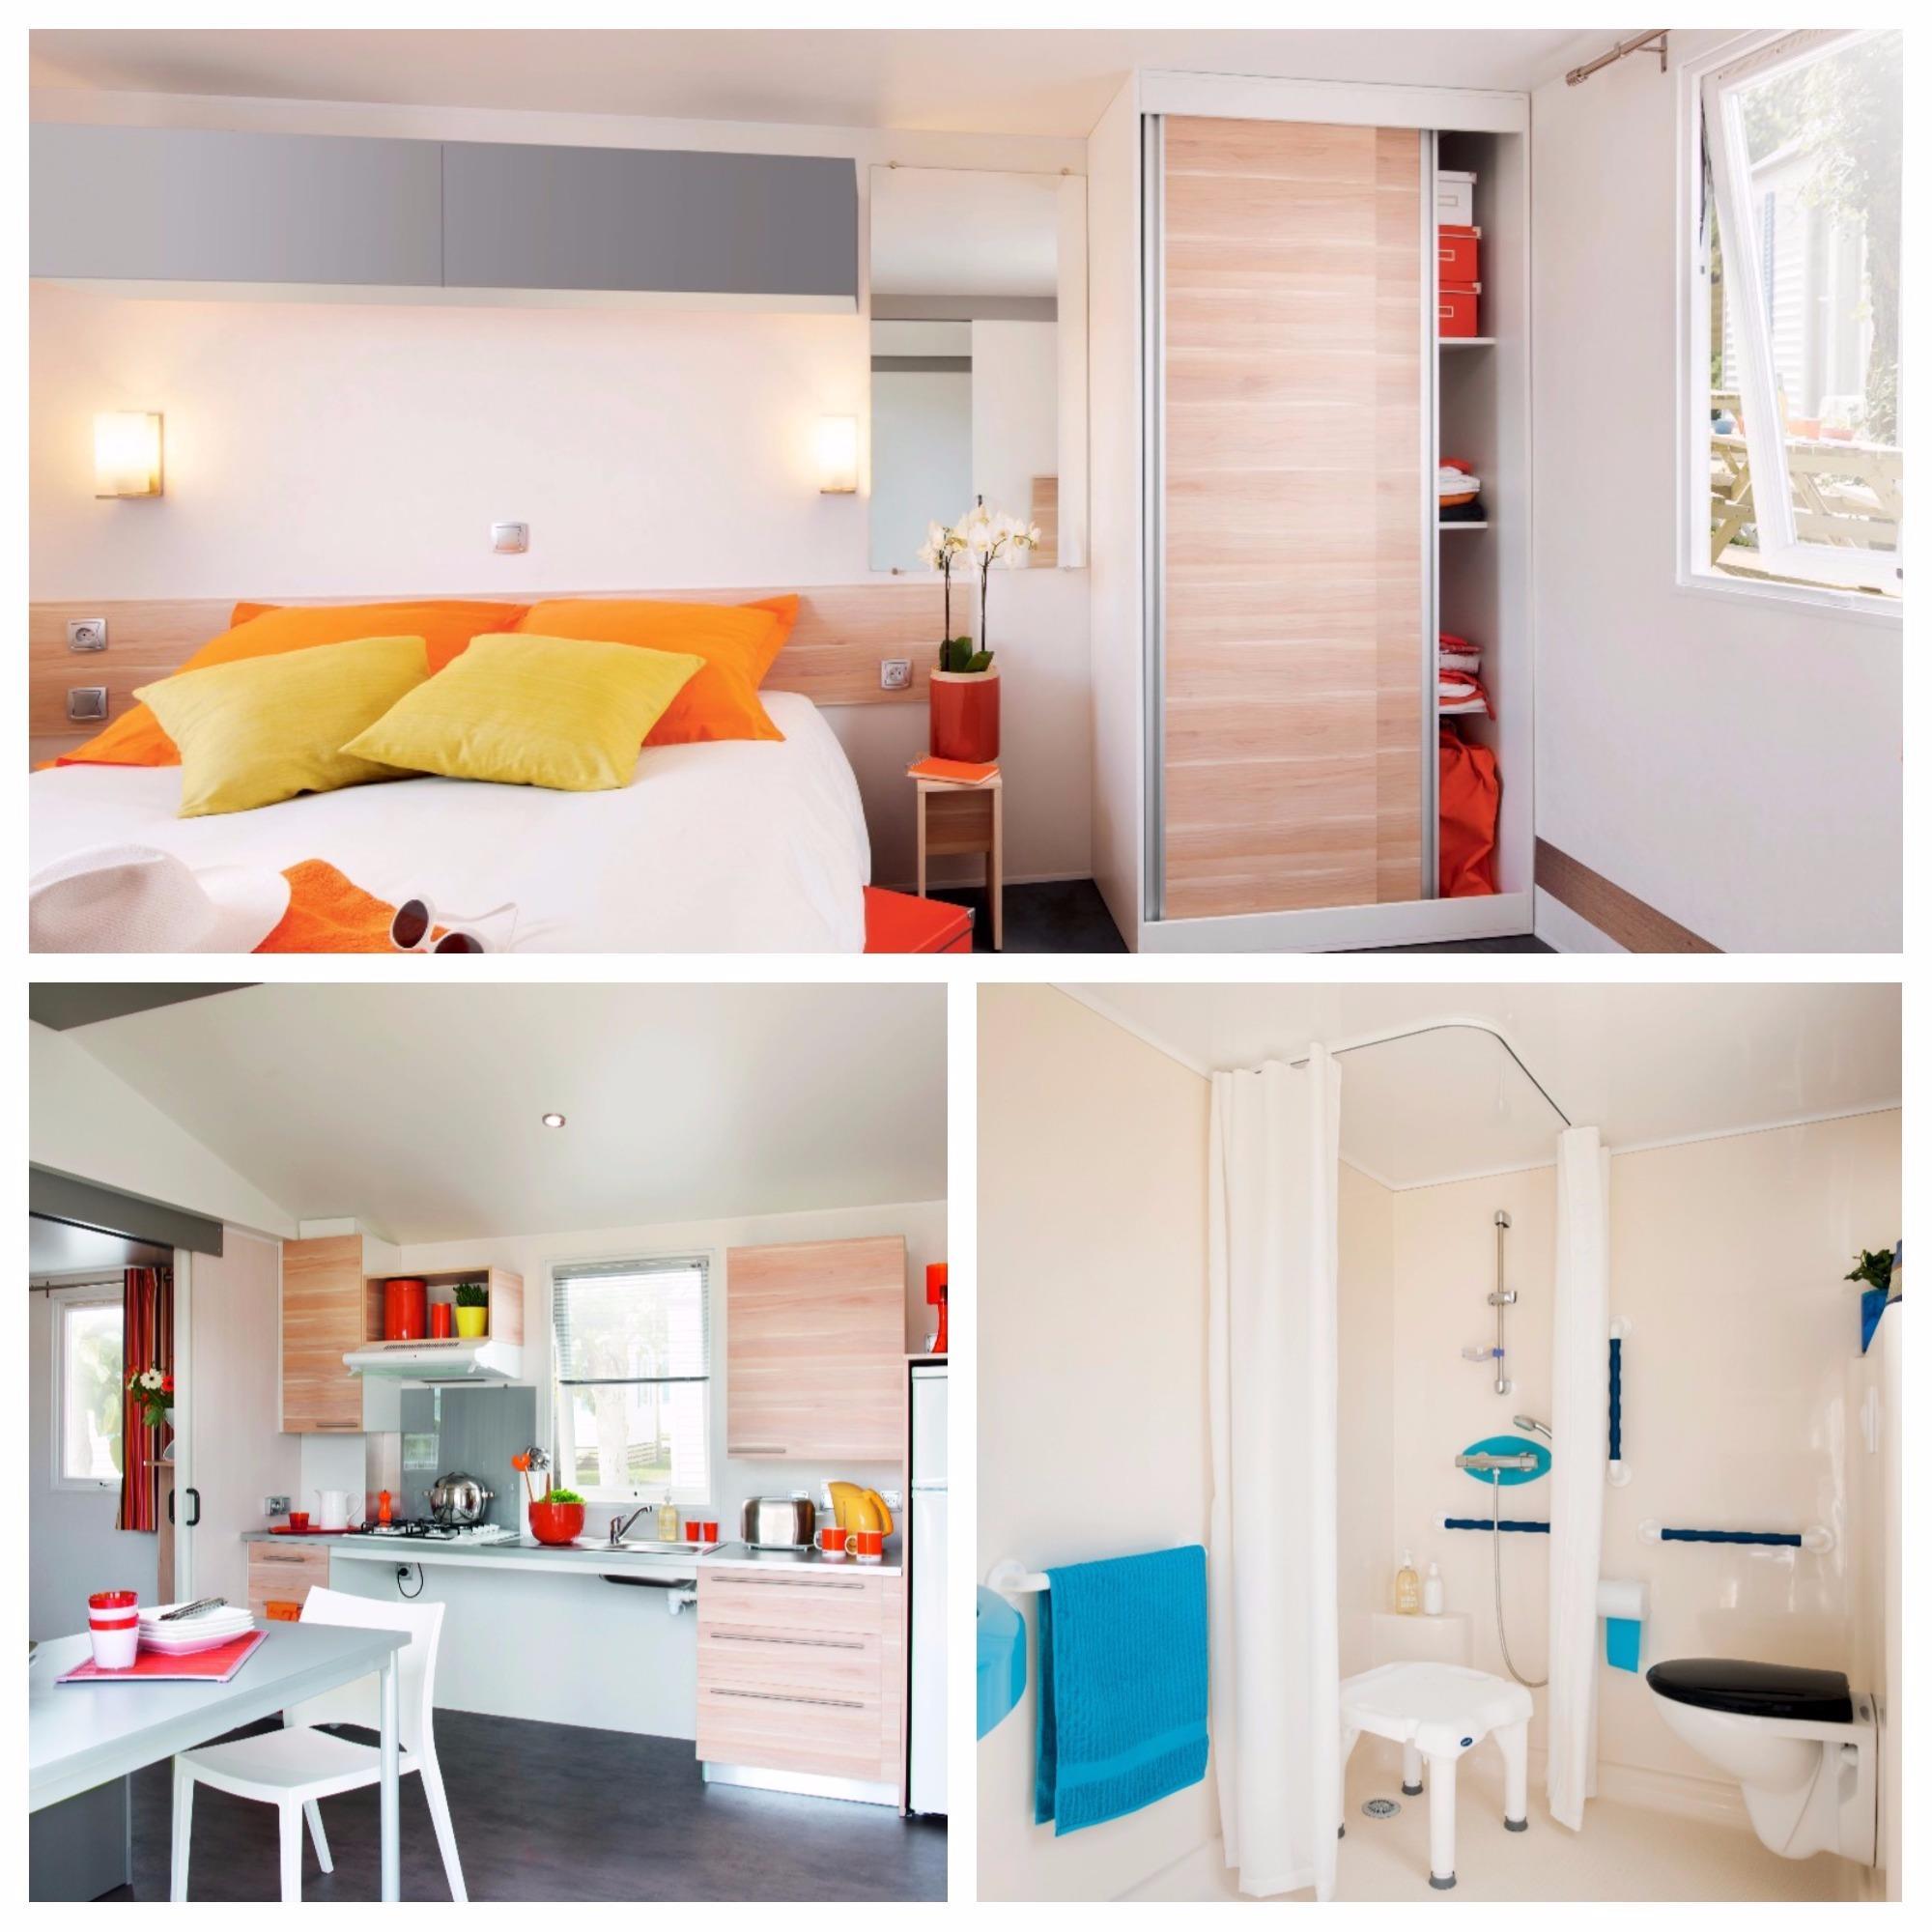 Location - Mobil Home Ciela Confort Pmr - 34M² - 2 Chambres - Climatisation Réversible Et Tv - Camping Resort La Rive